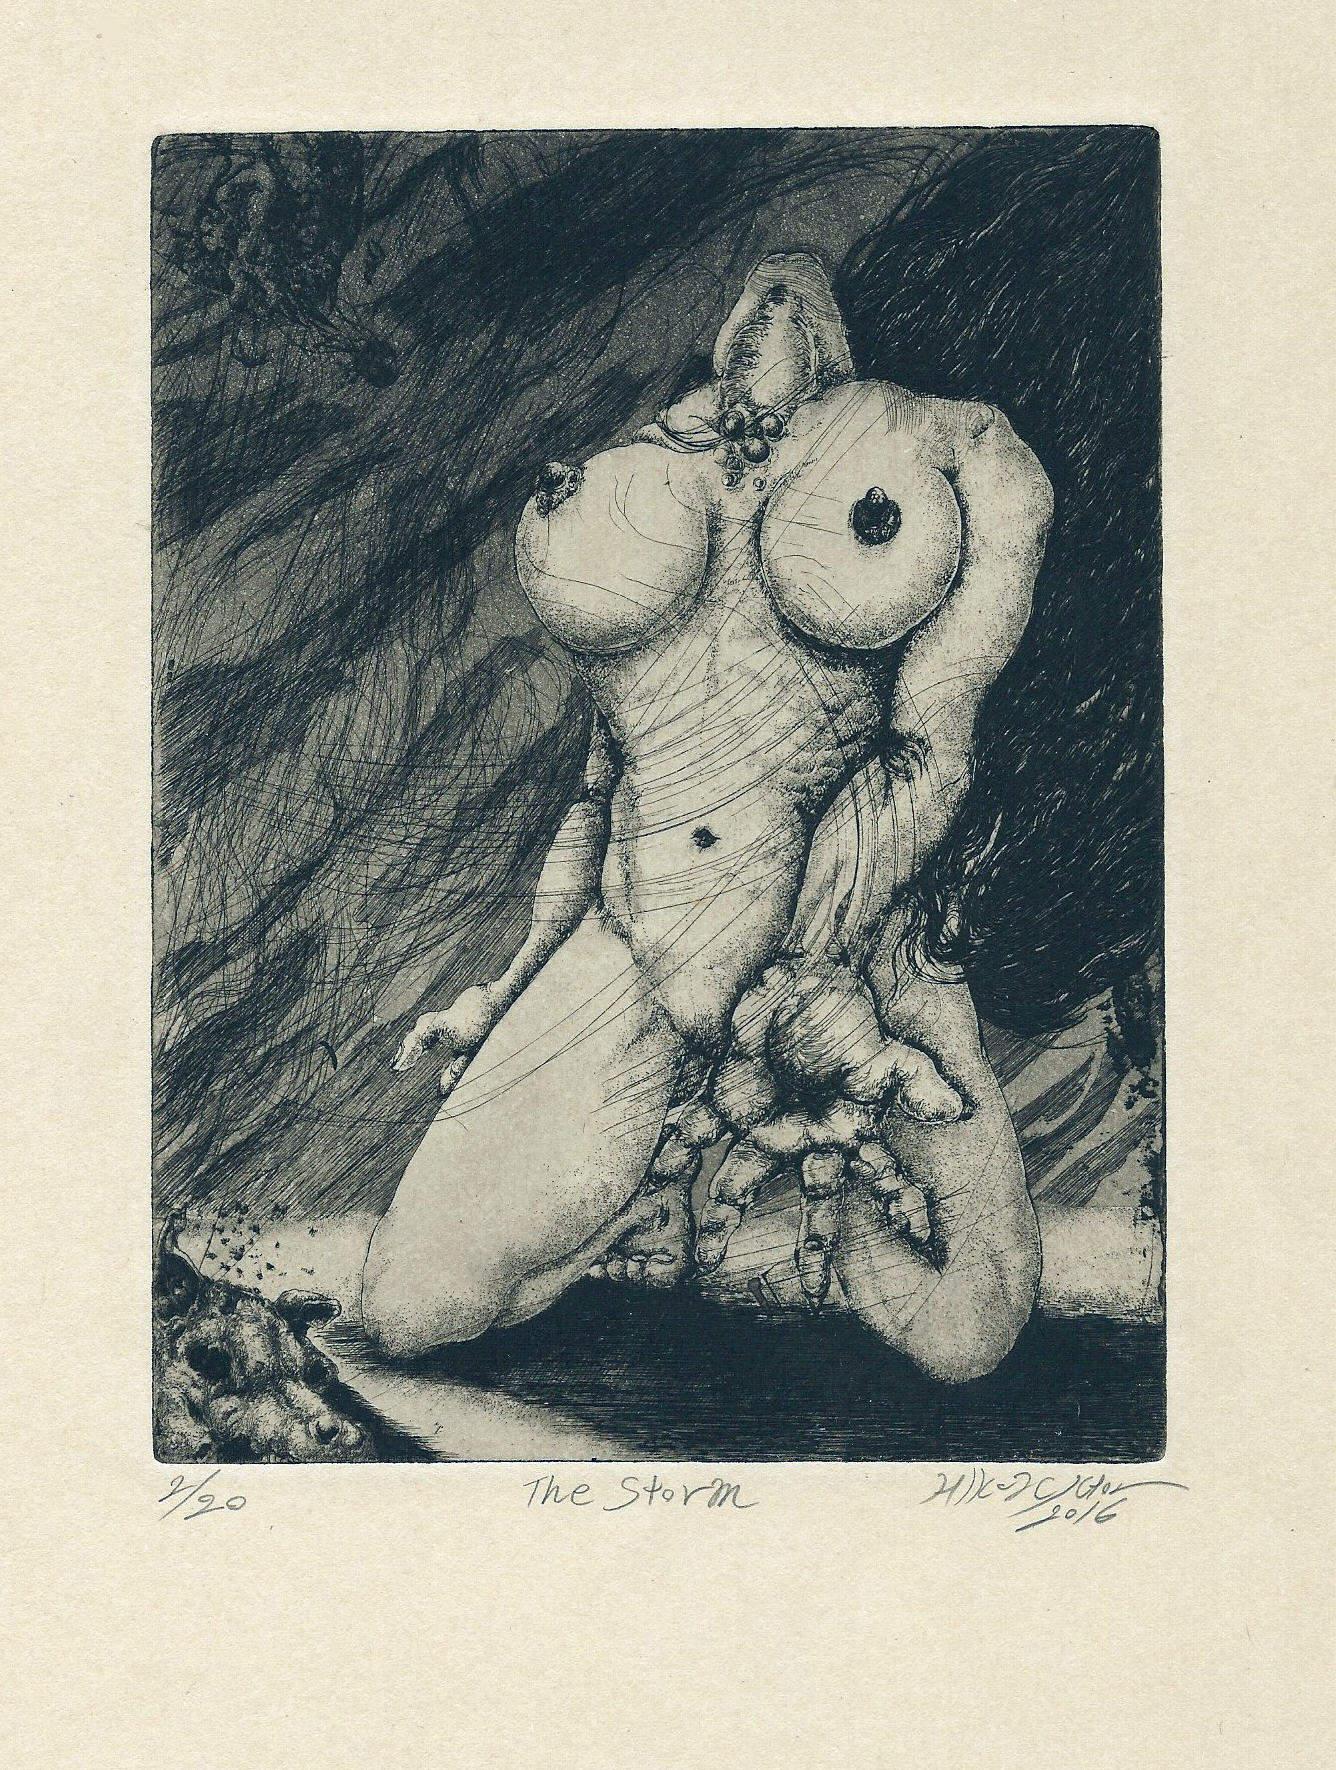 Hikaru Suto | THE STORM | etching, aquatint | 7x5 | 2016